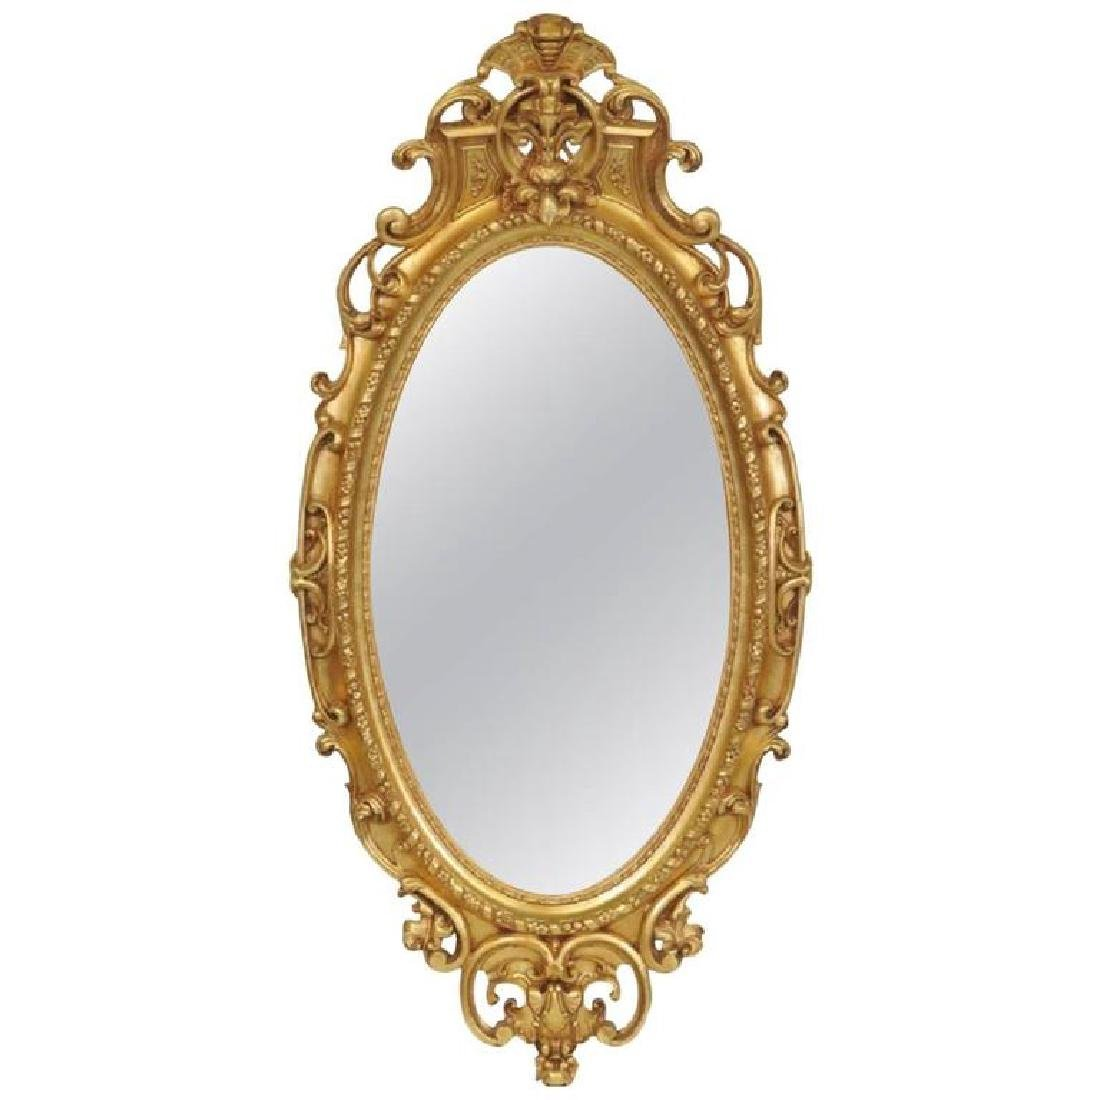 19th Century American Oval Gilt Mirror